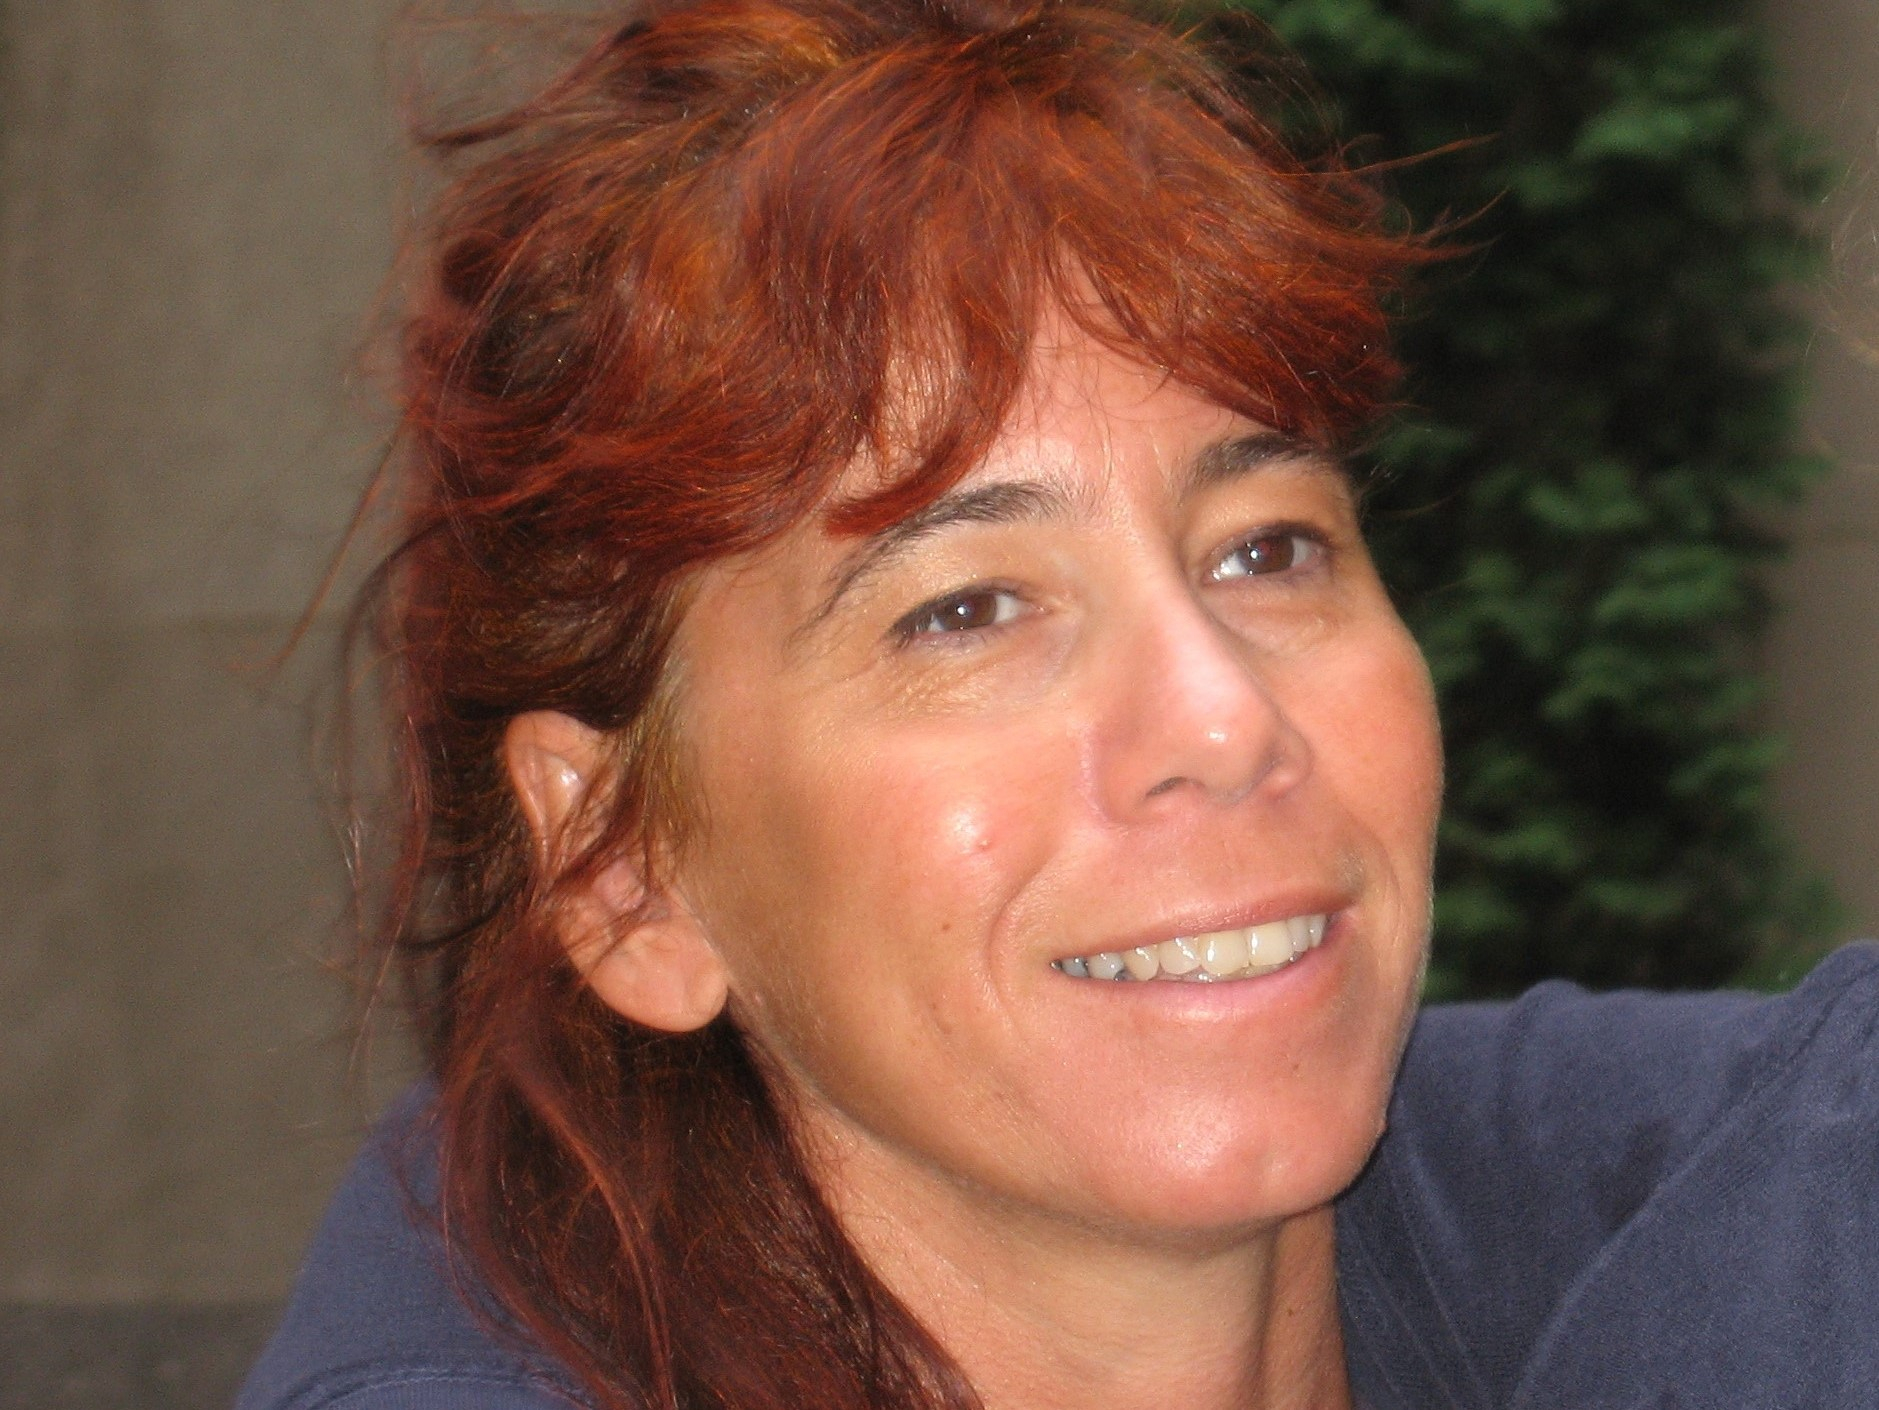 Cristiana Minelli